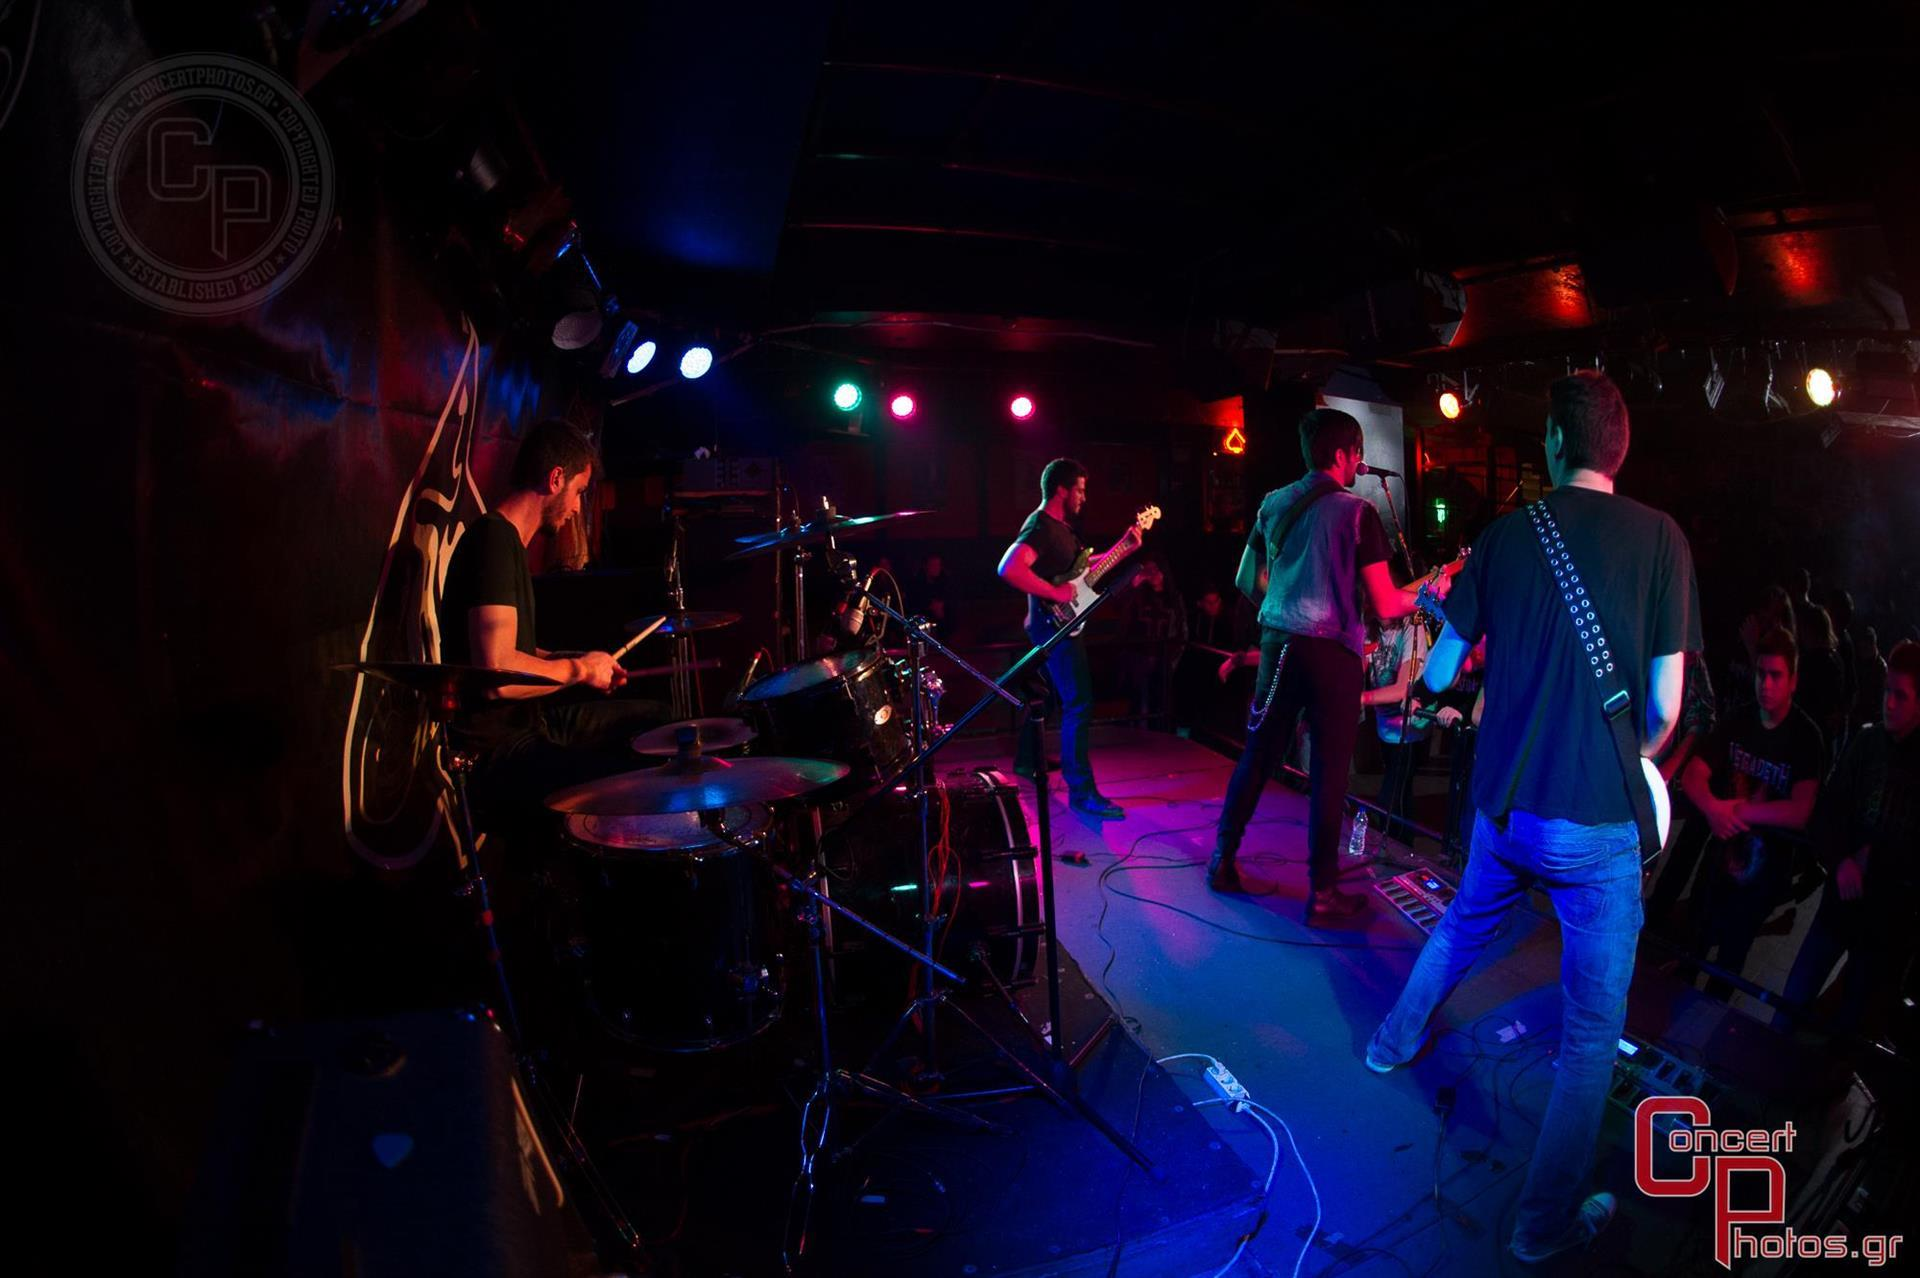 Battle Of The Bands Athens - Leg 3- photographer:  - ConcertPhotos - 20150104_2234_16